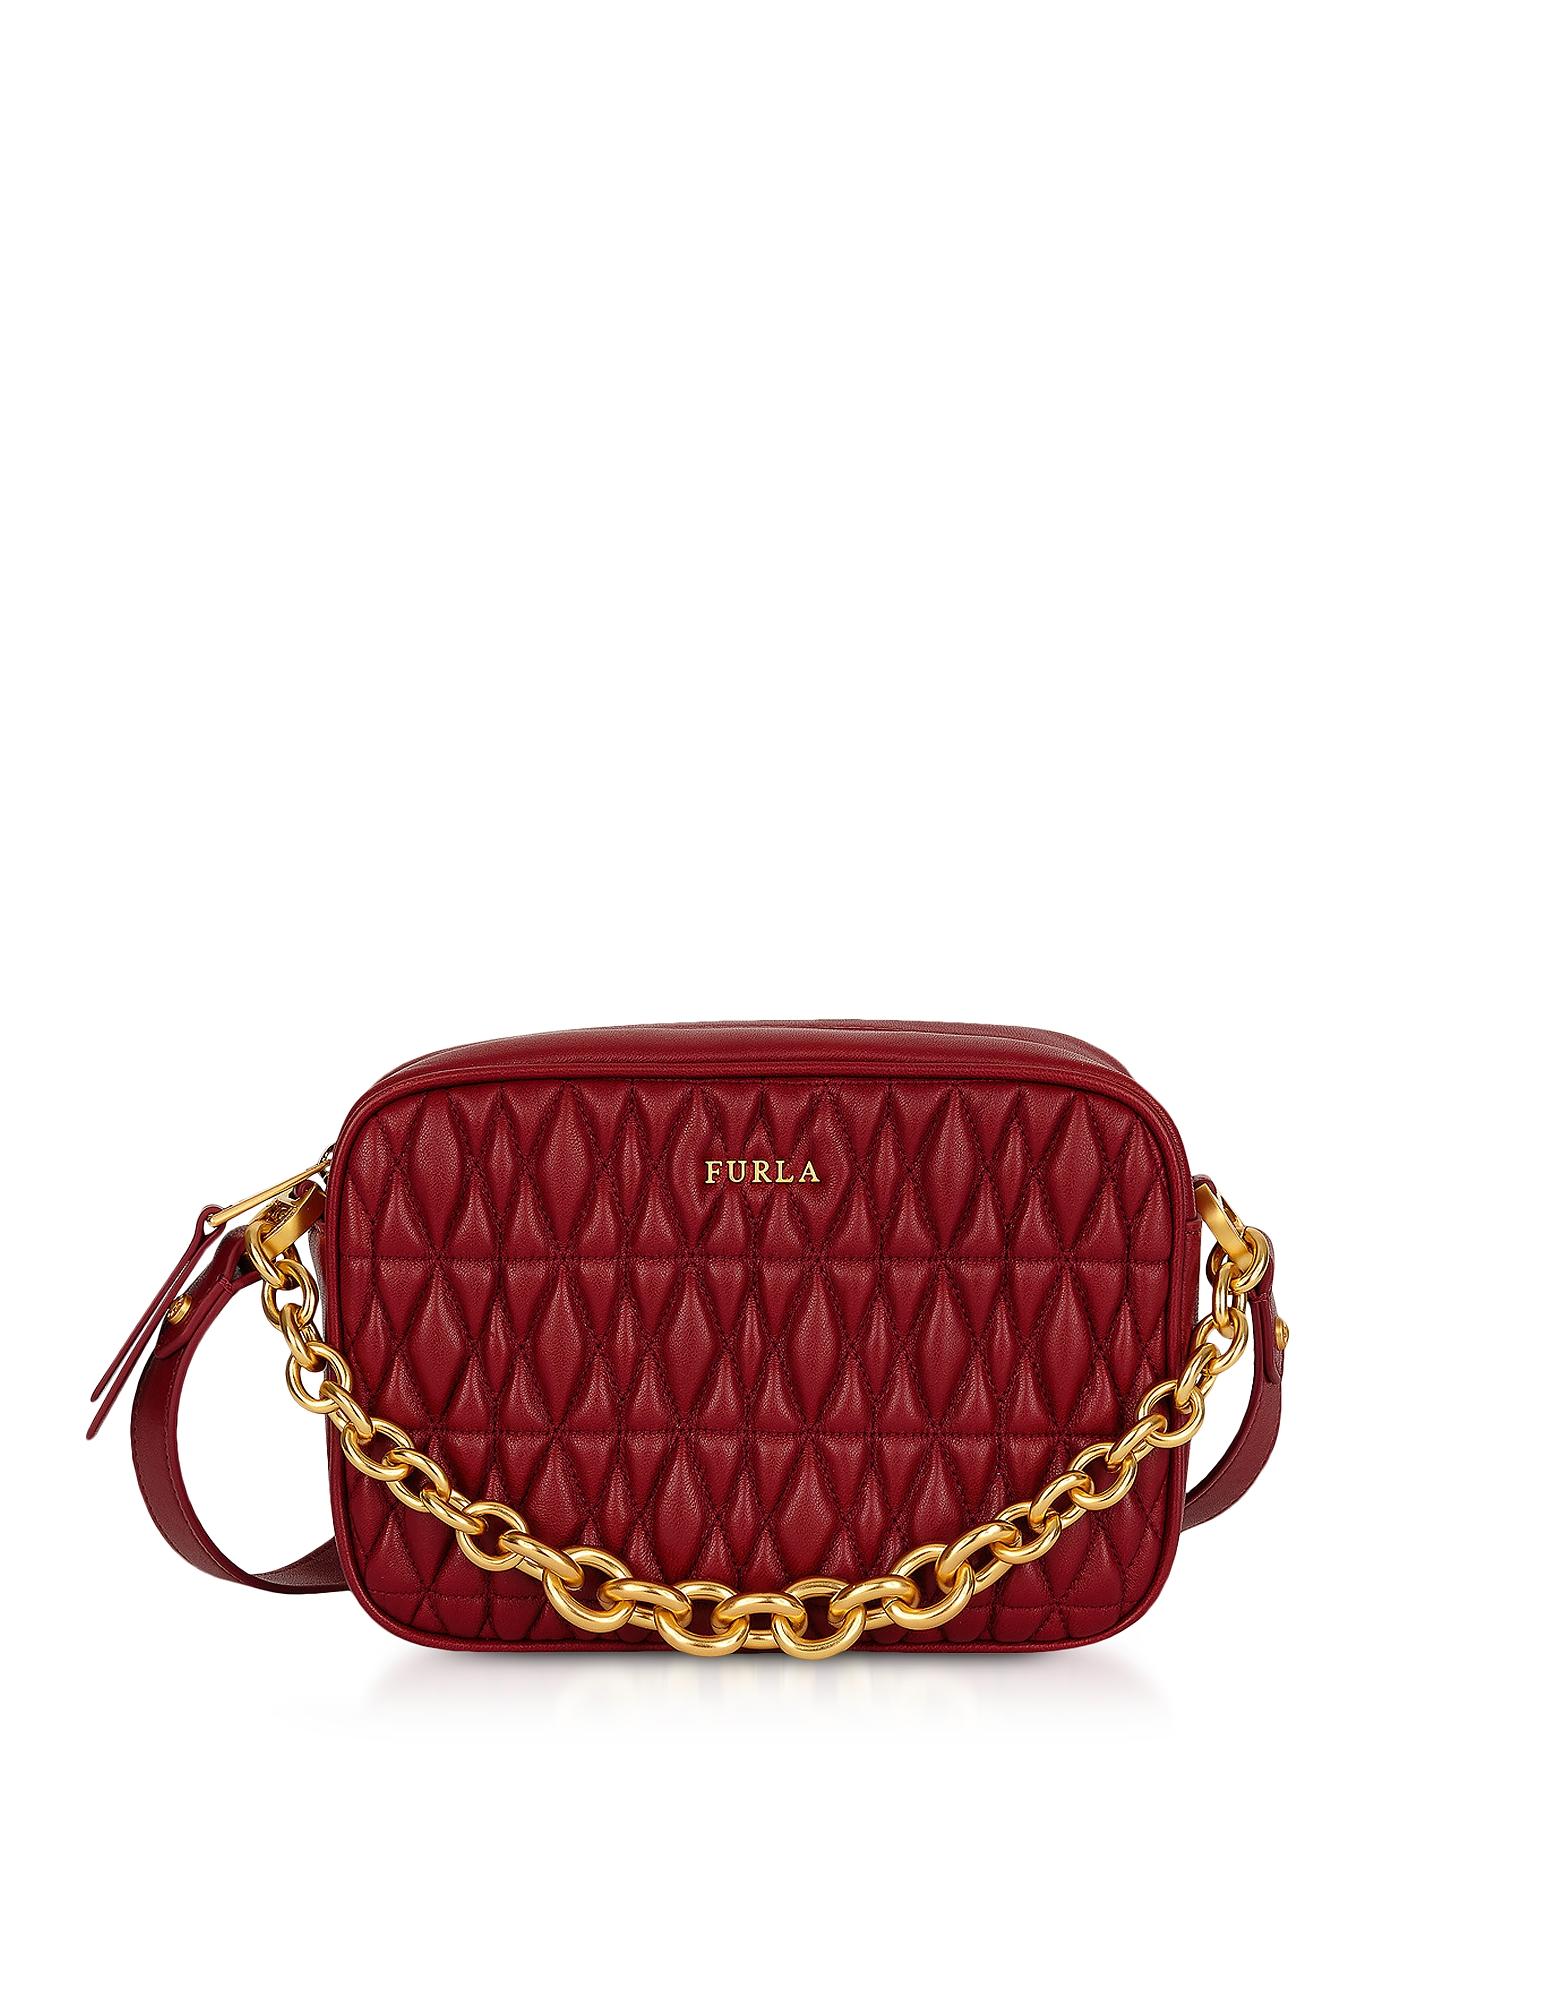 Furla Handbags, Quilted Leather Cometa Mini Crossbody Bag